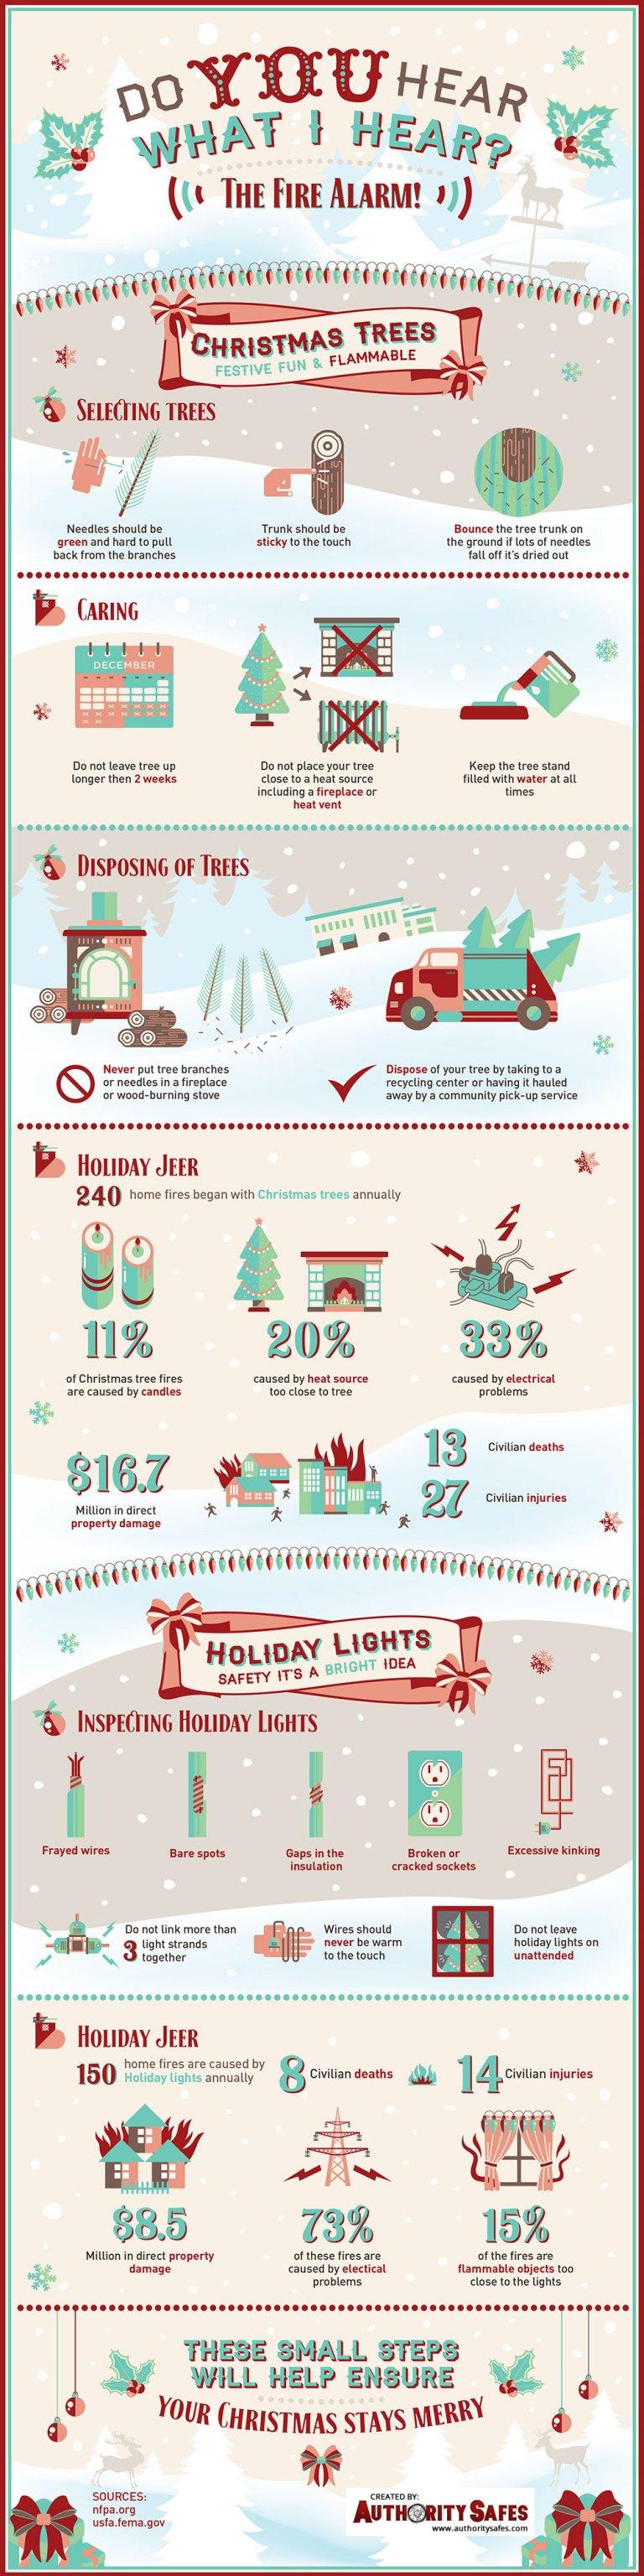 Philadelphia Christmas Tree Disposal